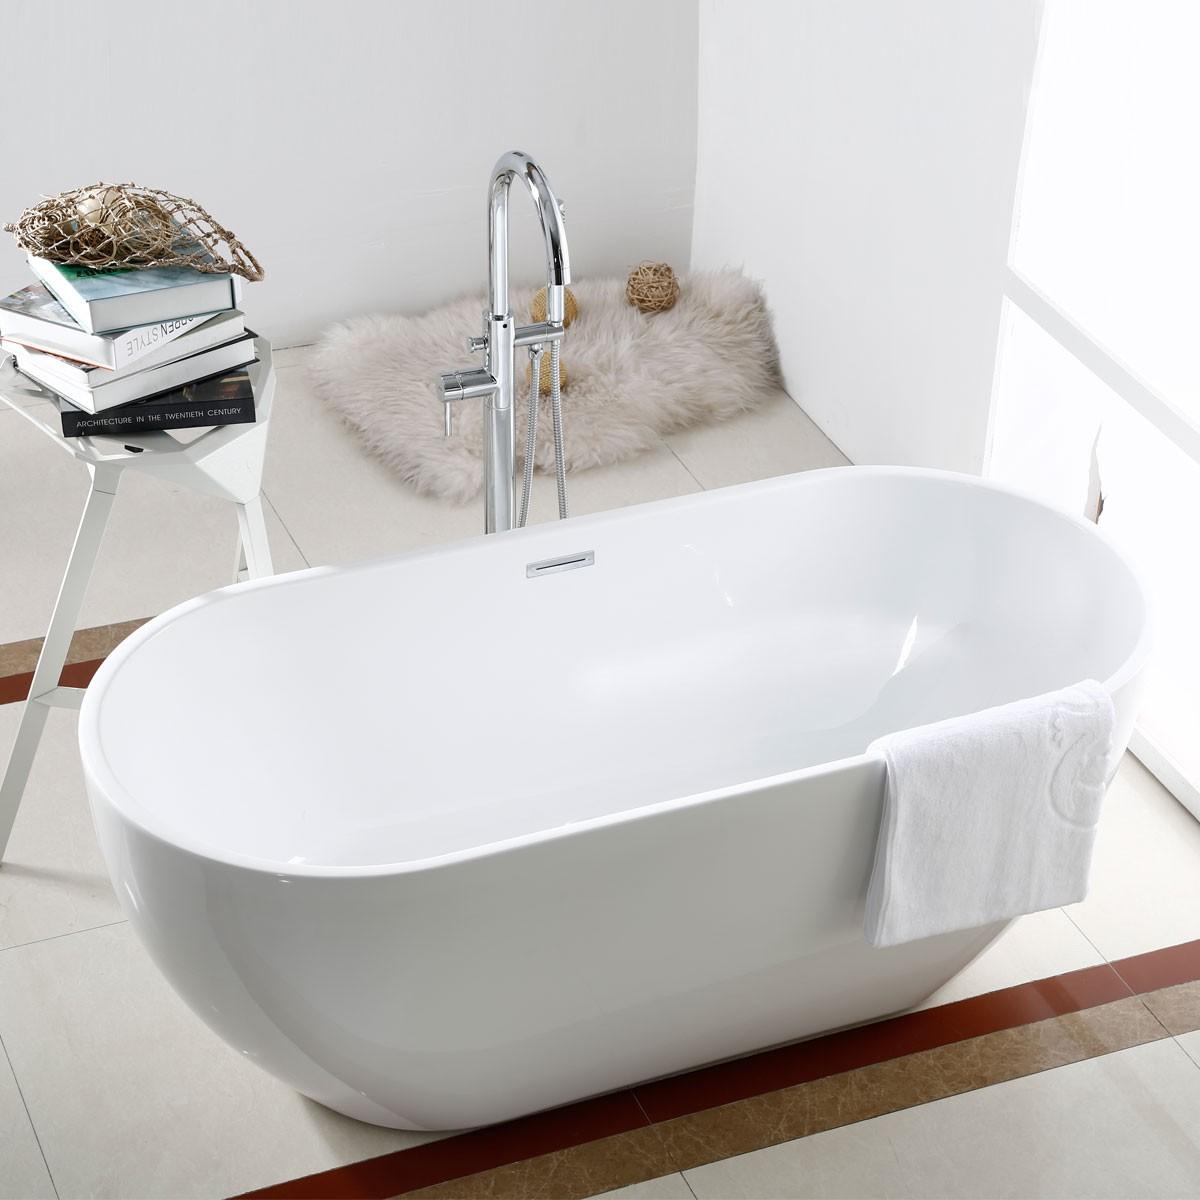 faucet in p tub freestanding white polar bottom flatbottom no bathtubs bathtub flat acrylic renwil cheap tubs